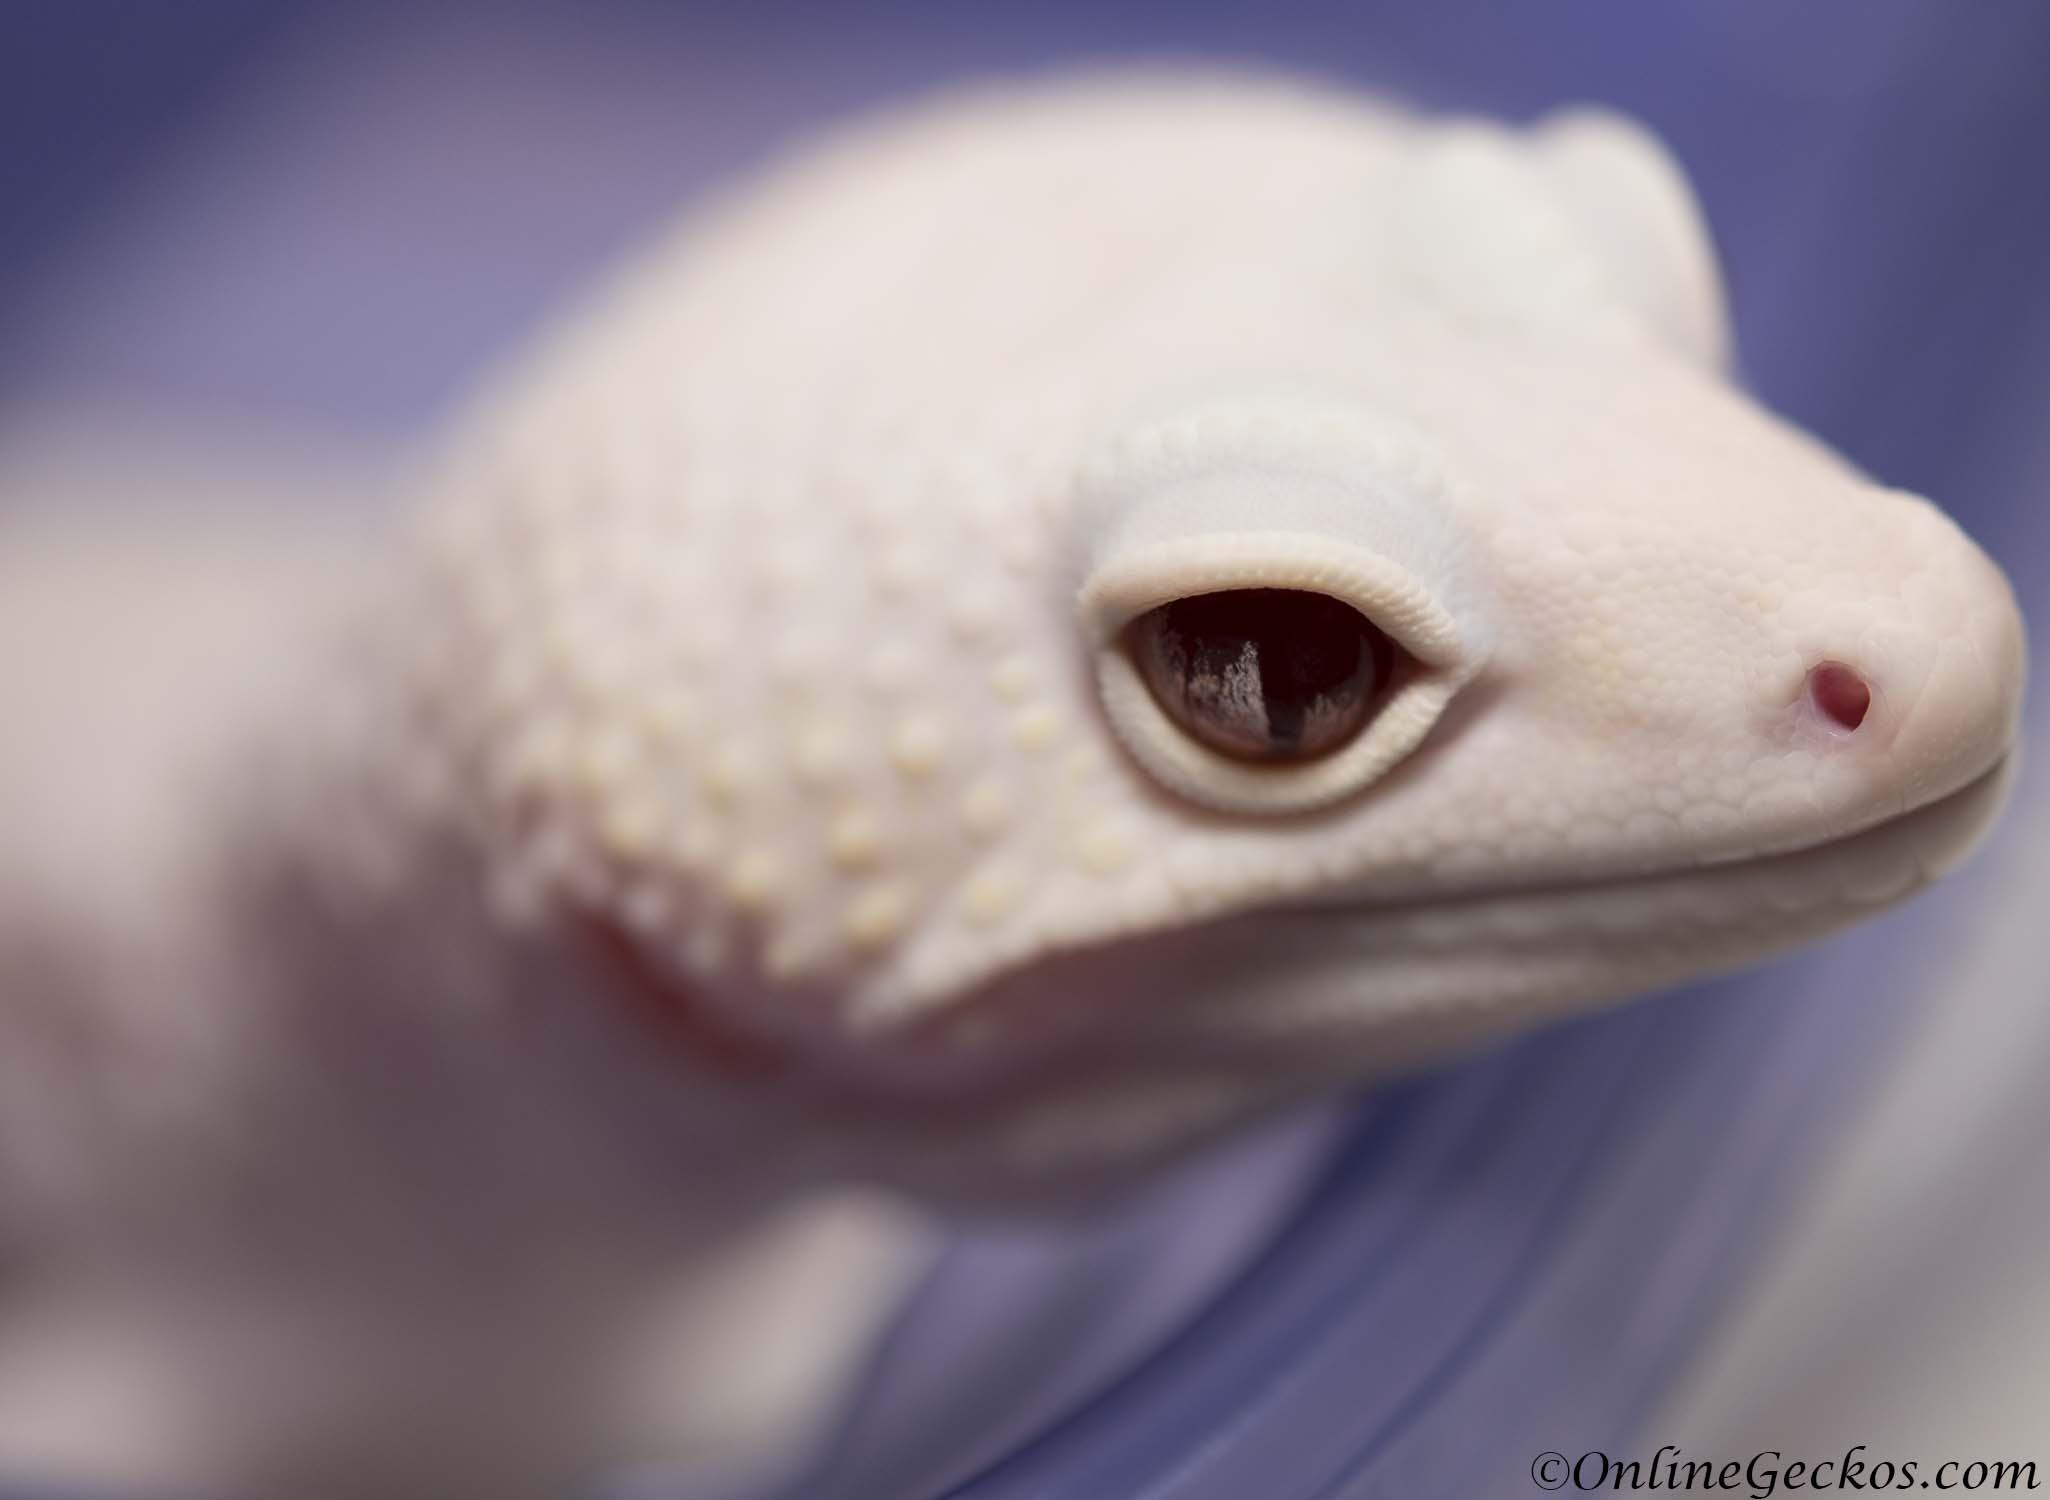 Leopard Gecko Breeding Season 2018 - OnlineGeckos.com ...Live Leopard Gecko Hatching